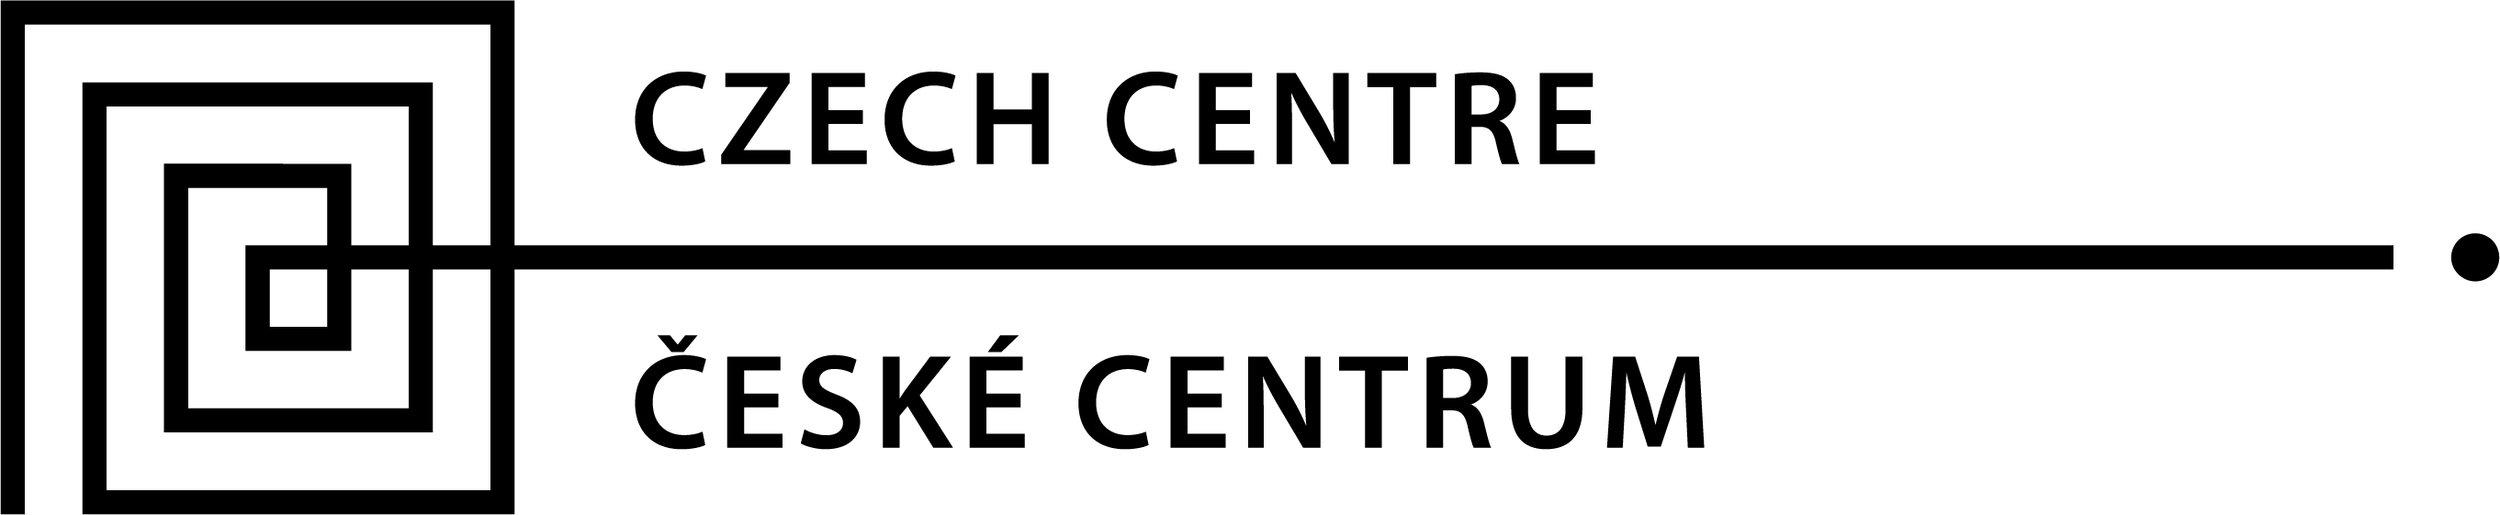 CCL logo - black - RGB.jpg